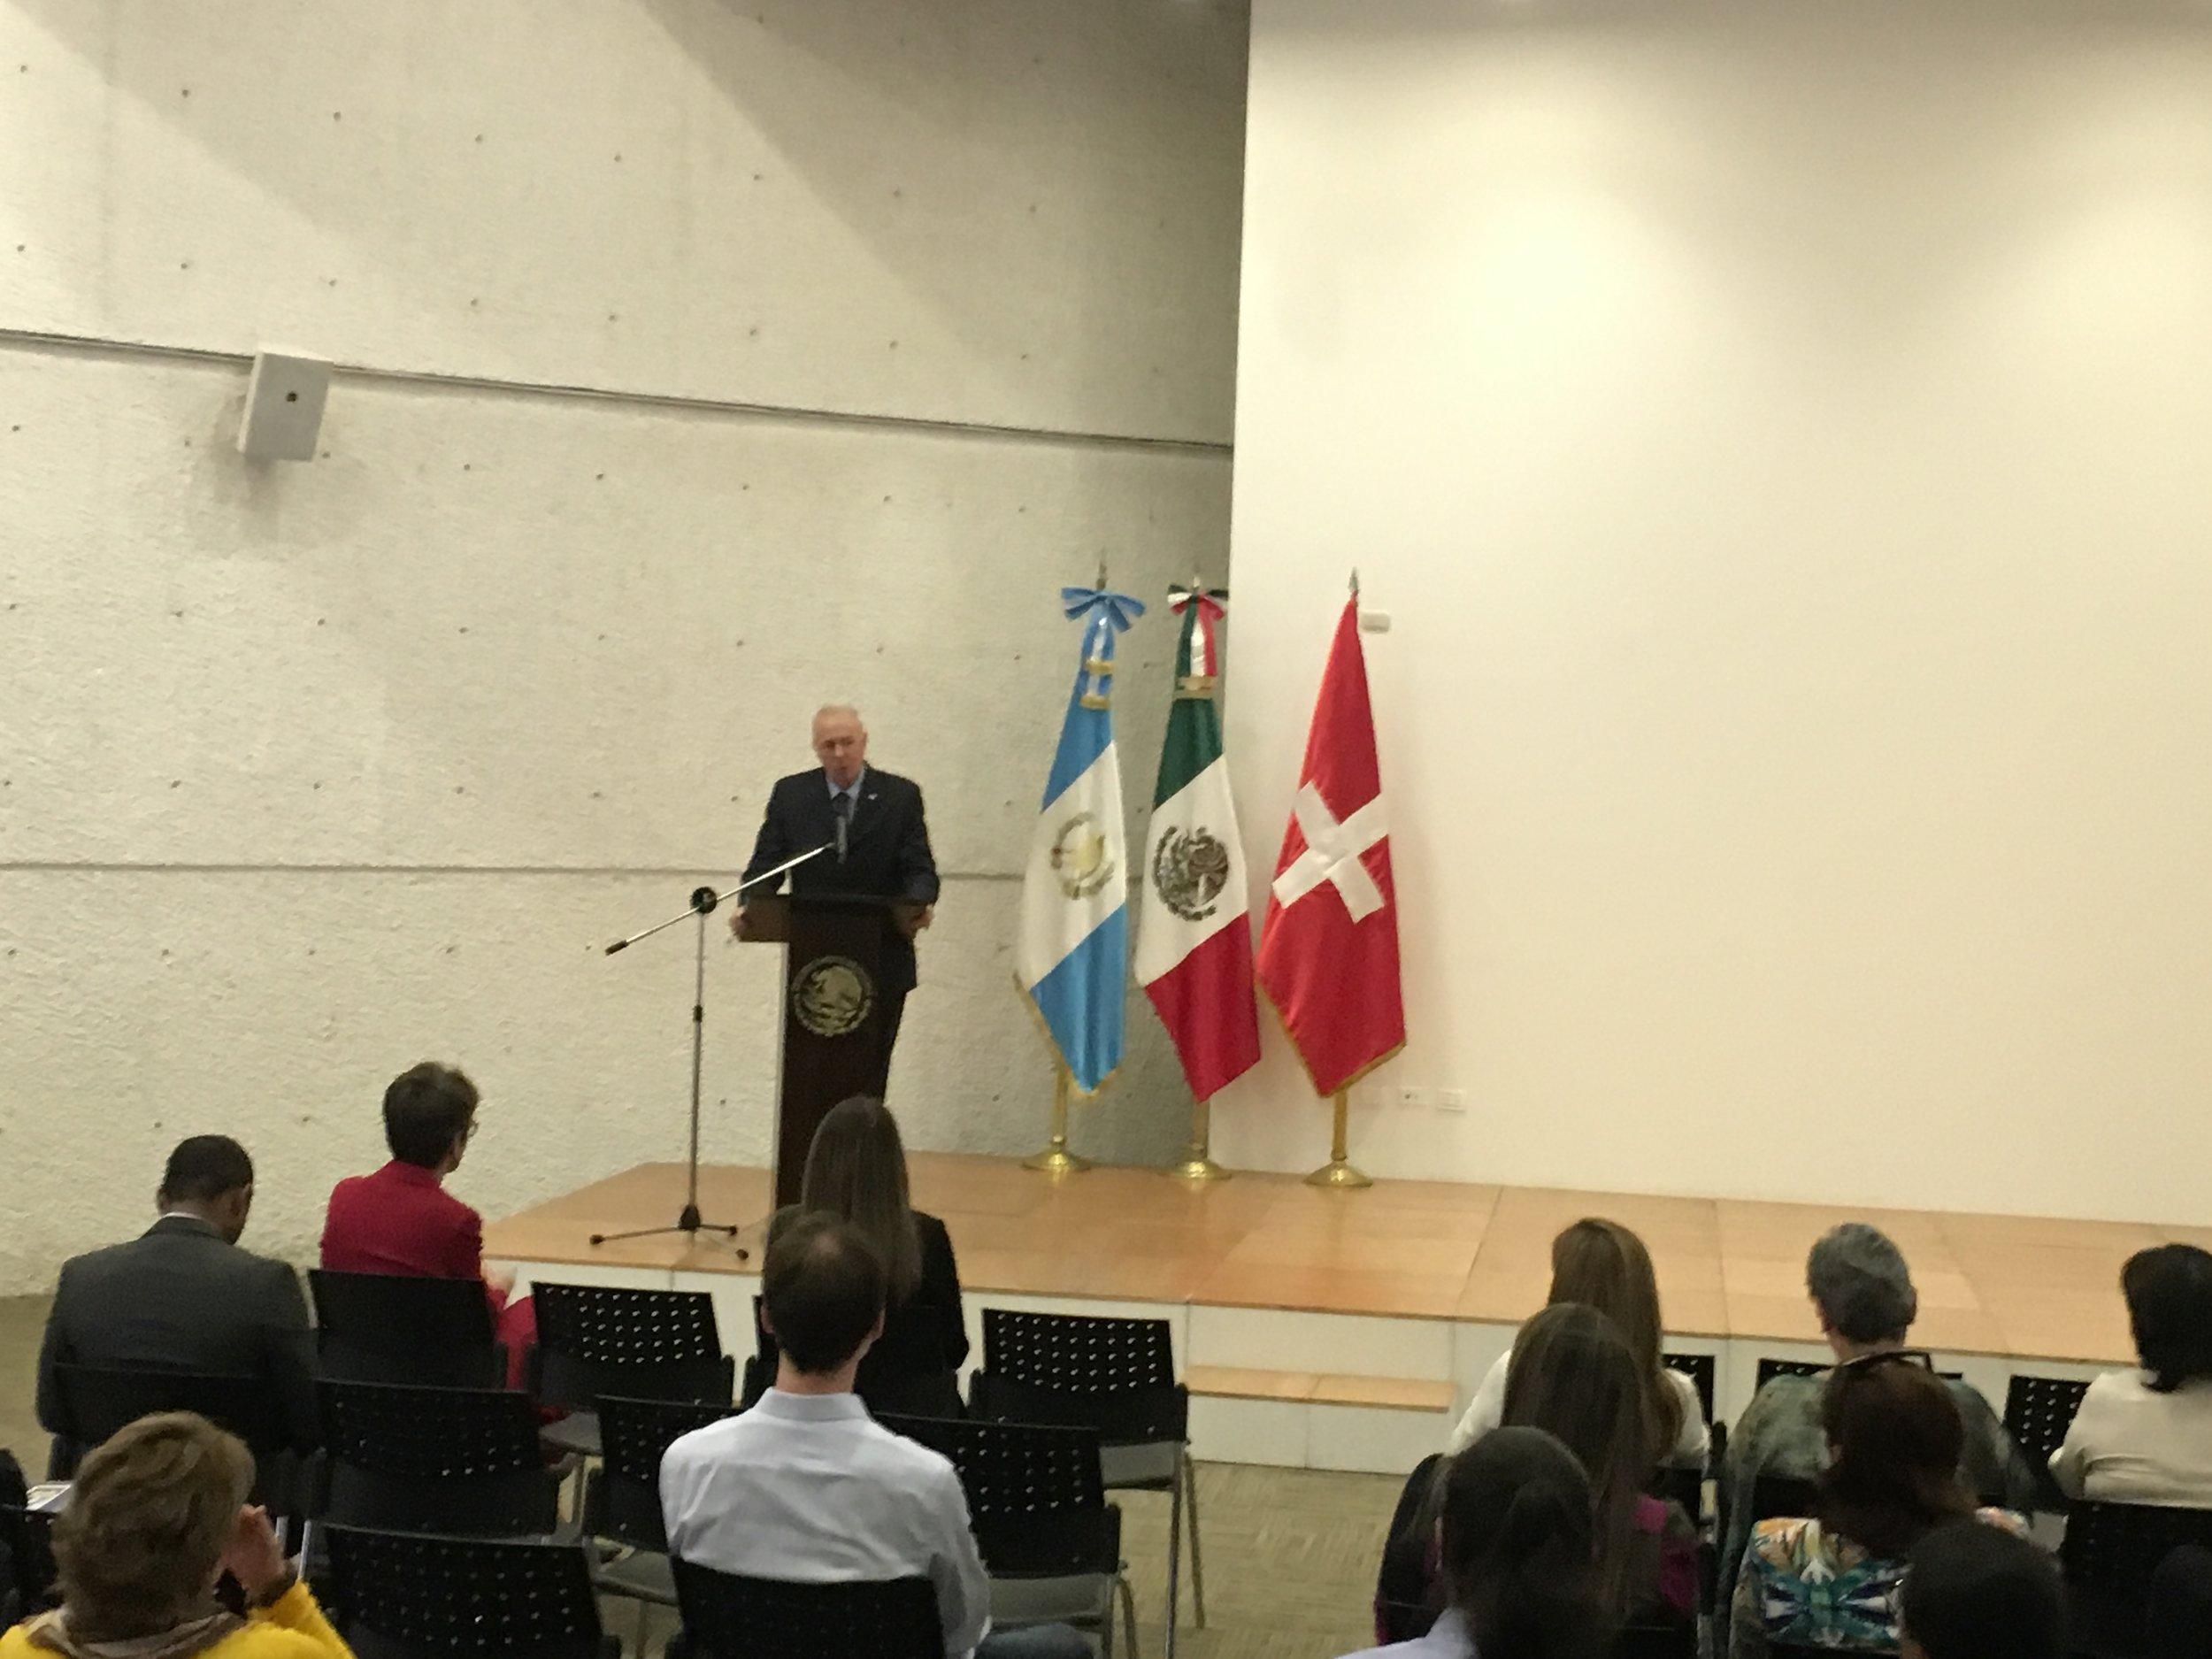 Swiss ambassador Hans-Ruedi Bortis presenting LA PRENDA on April 19, 2018, in Guatemala City.